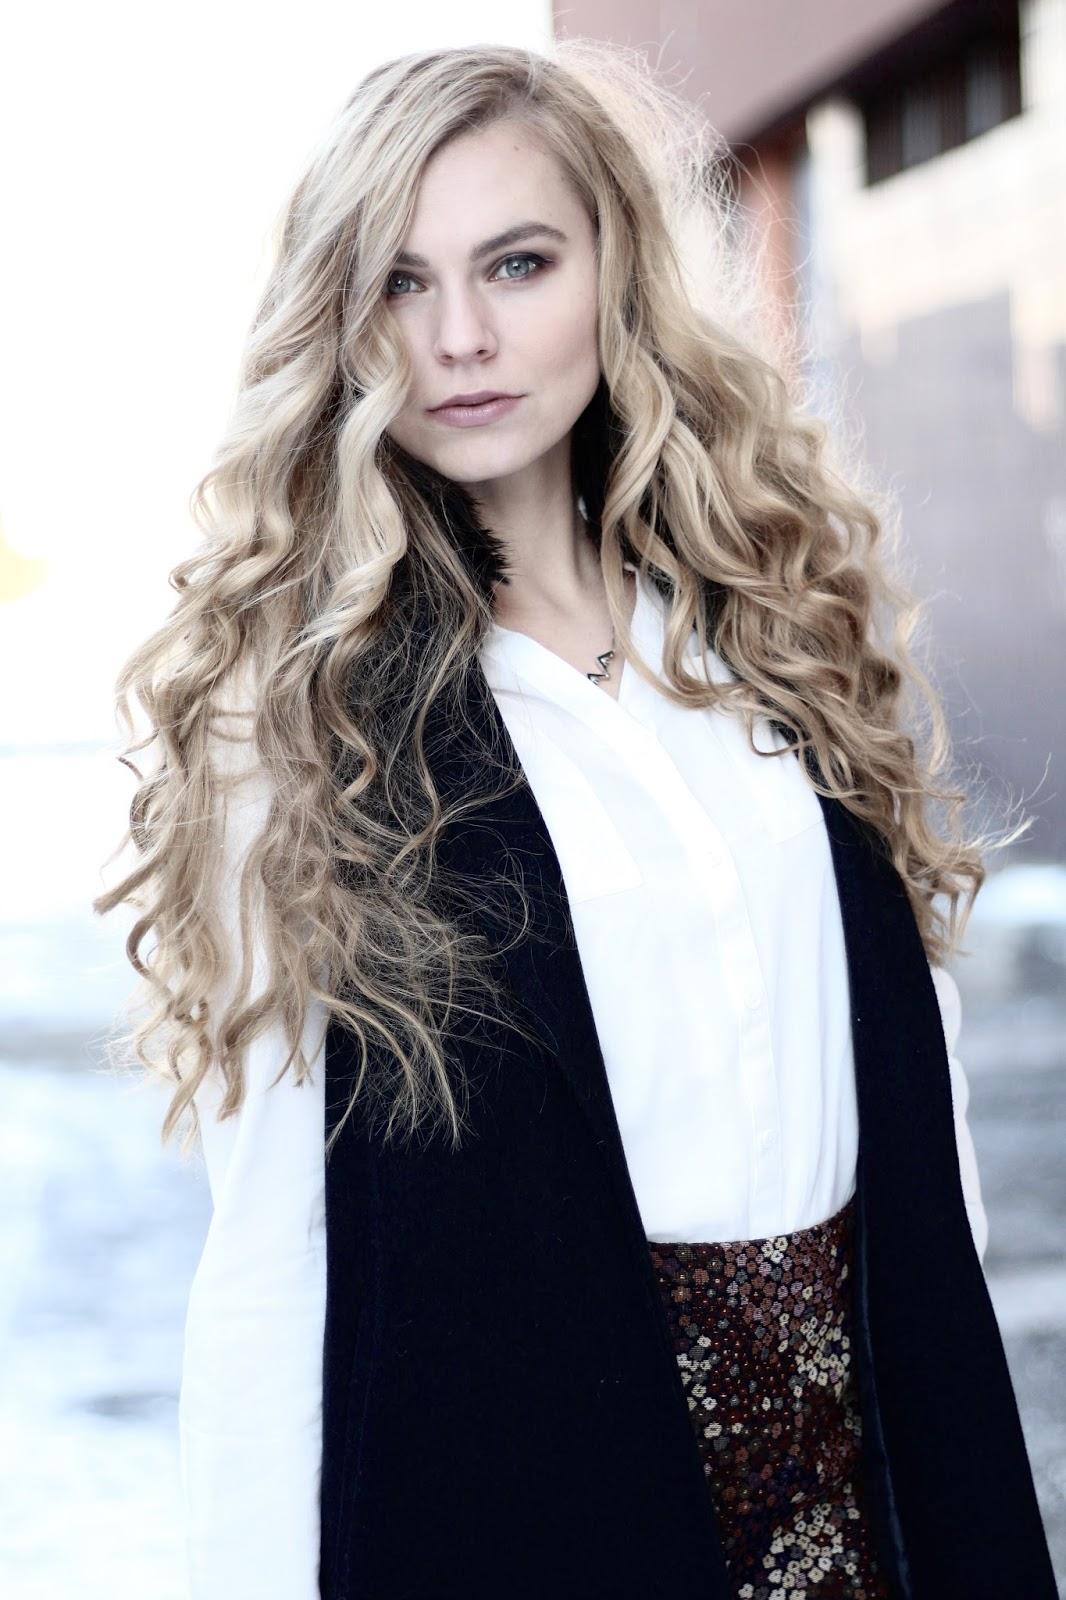 vawy hair, long hair